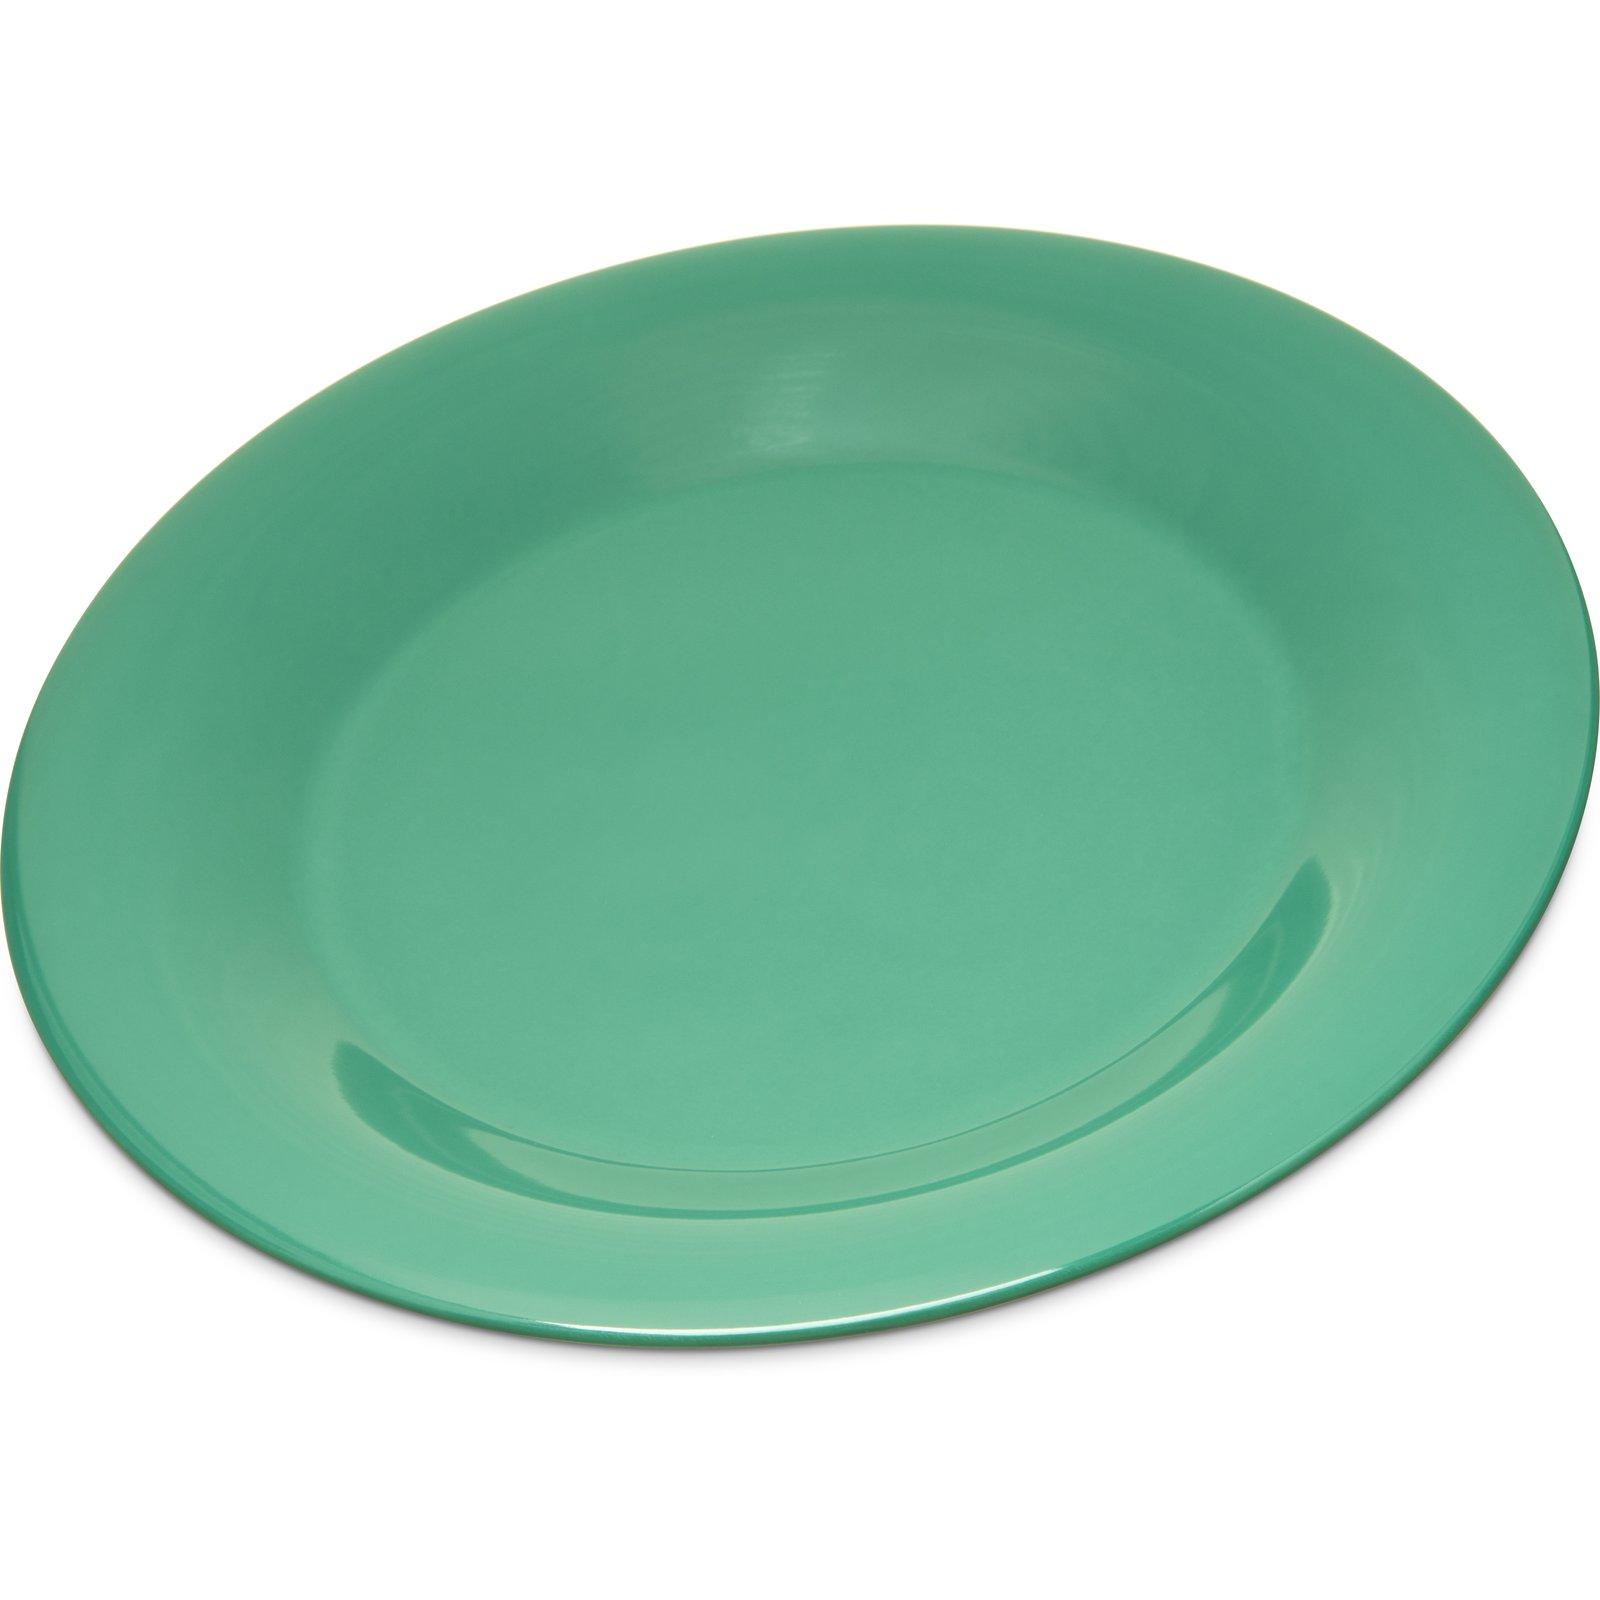 4301209 - Durus® Melamine Wide Rim Dinner Plate 9  - Green  sc 1 st  Carlisle FoodService Products & 4301209 - Durus® Melamine Wide Rim Dinner Plate 9